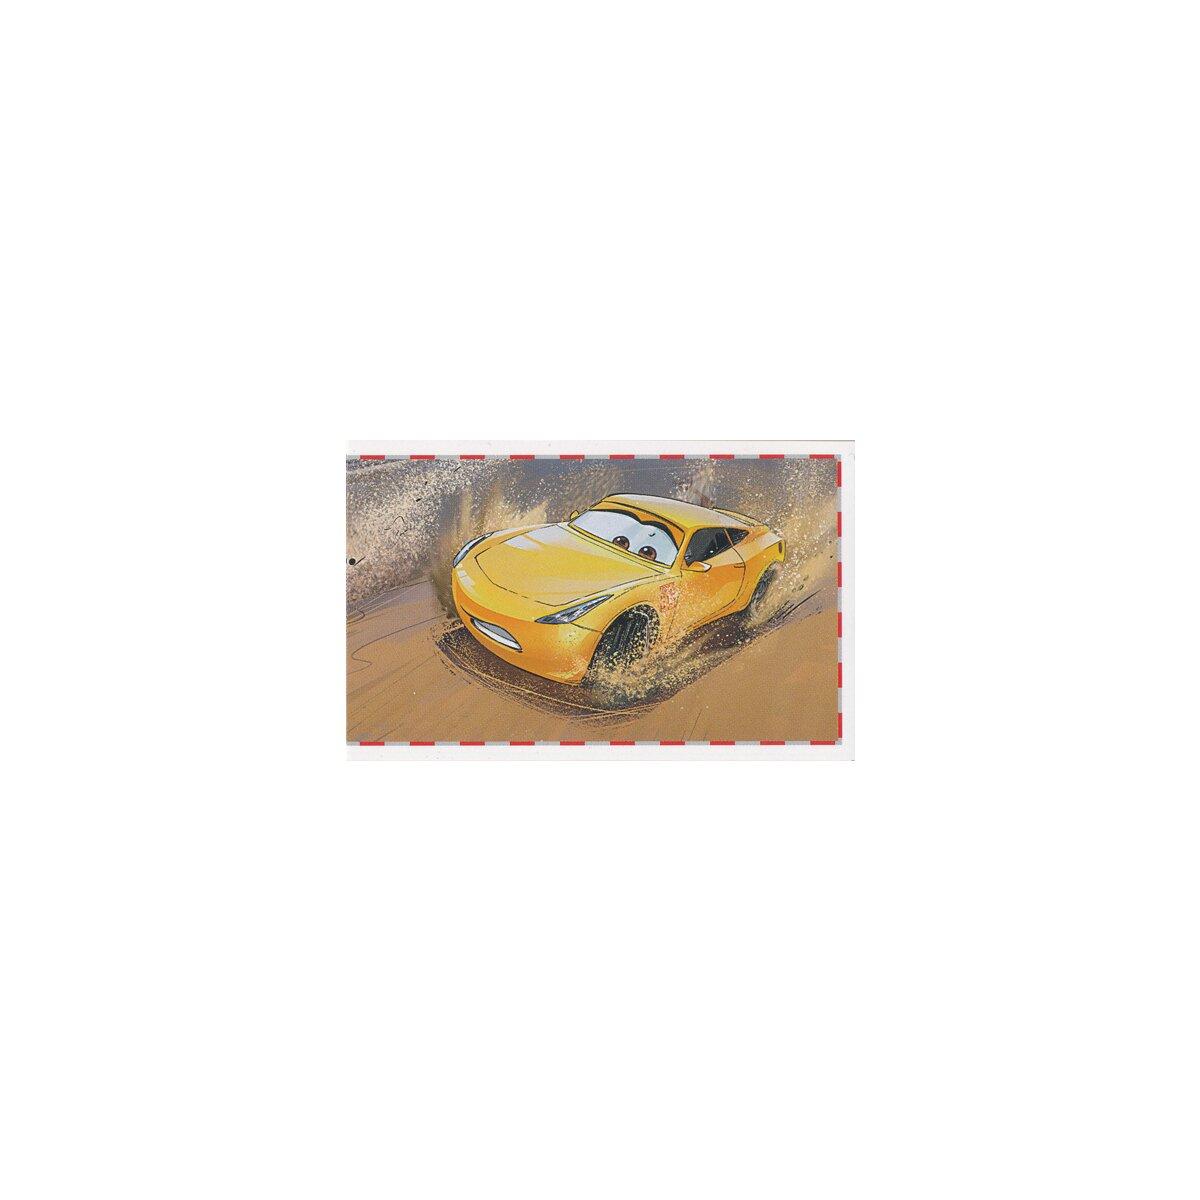 Panini-Cars 3 sammelsticker-Sticker x1